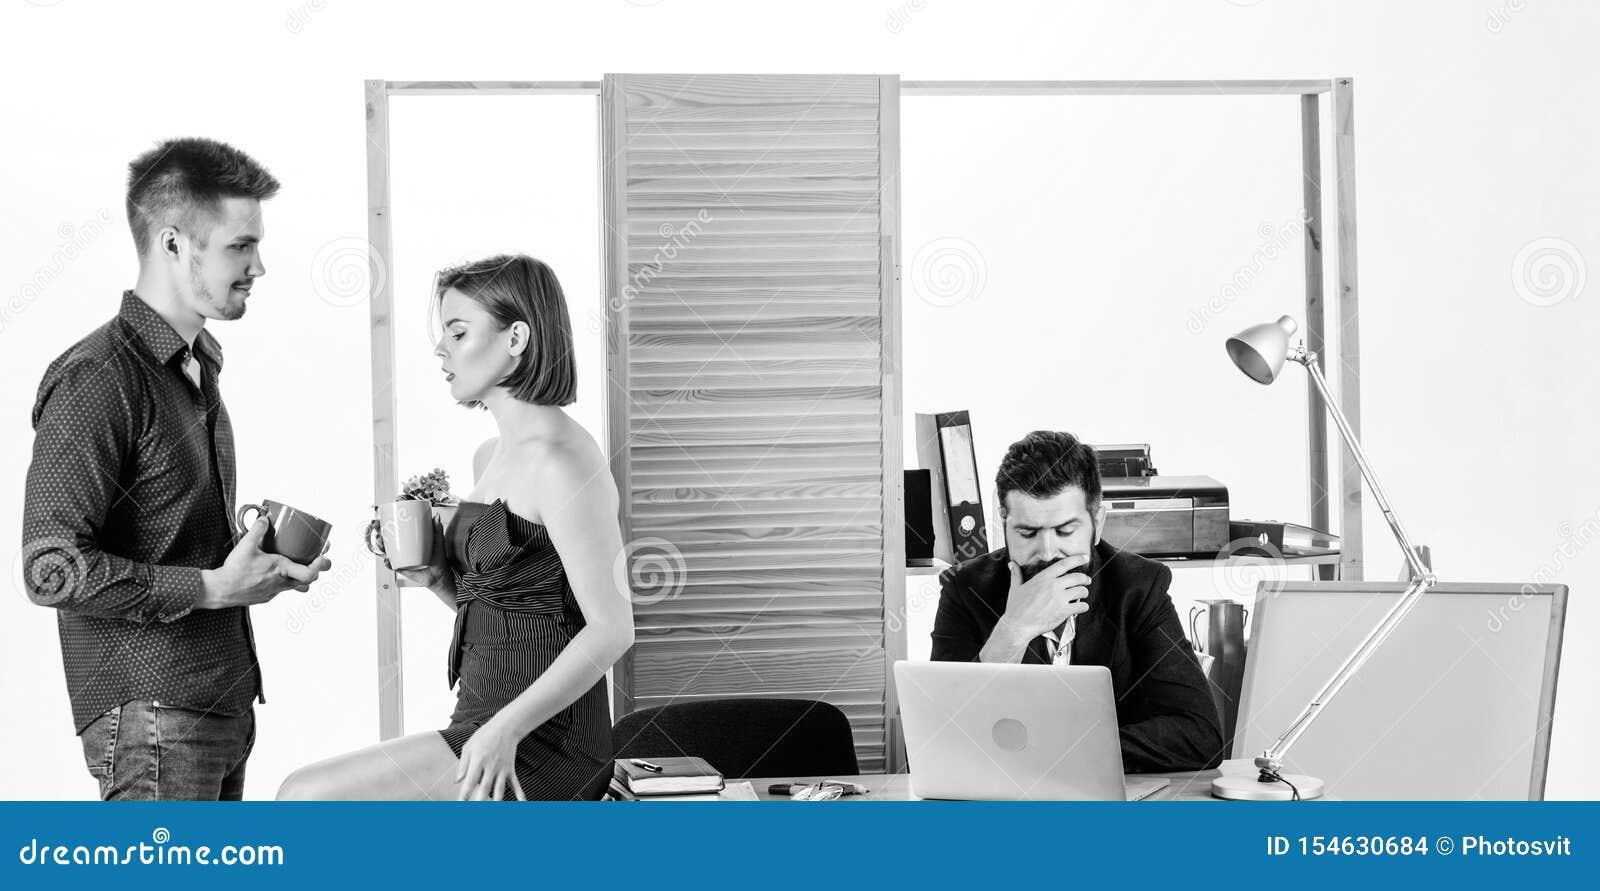 Sunda coworkers f?r frukost som tv? dricker te eller kaffe f?r unga chefer f?r frukost som talar under frukosttid